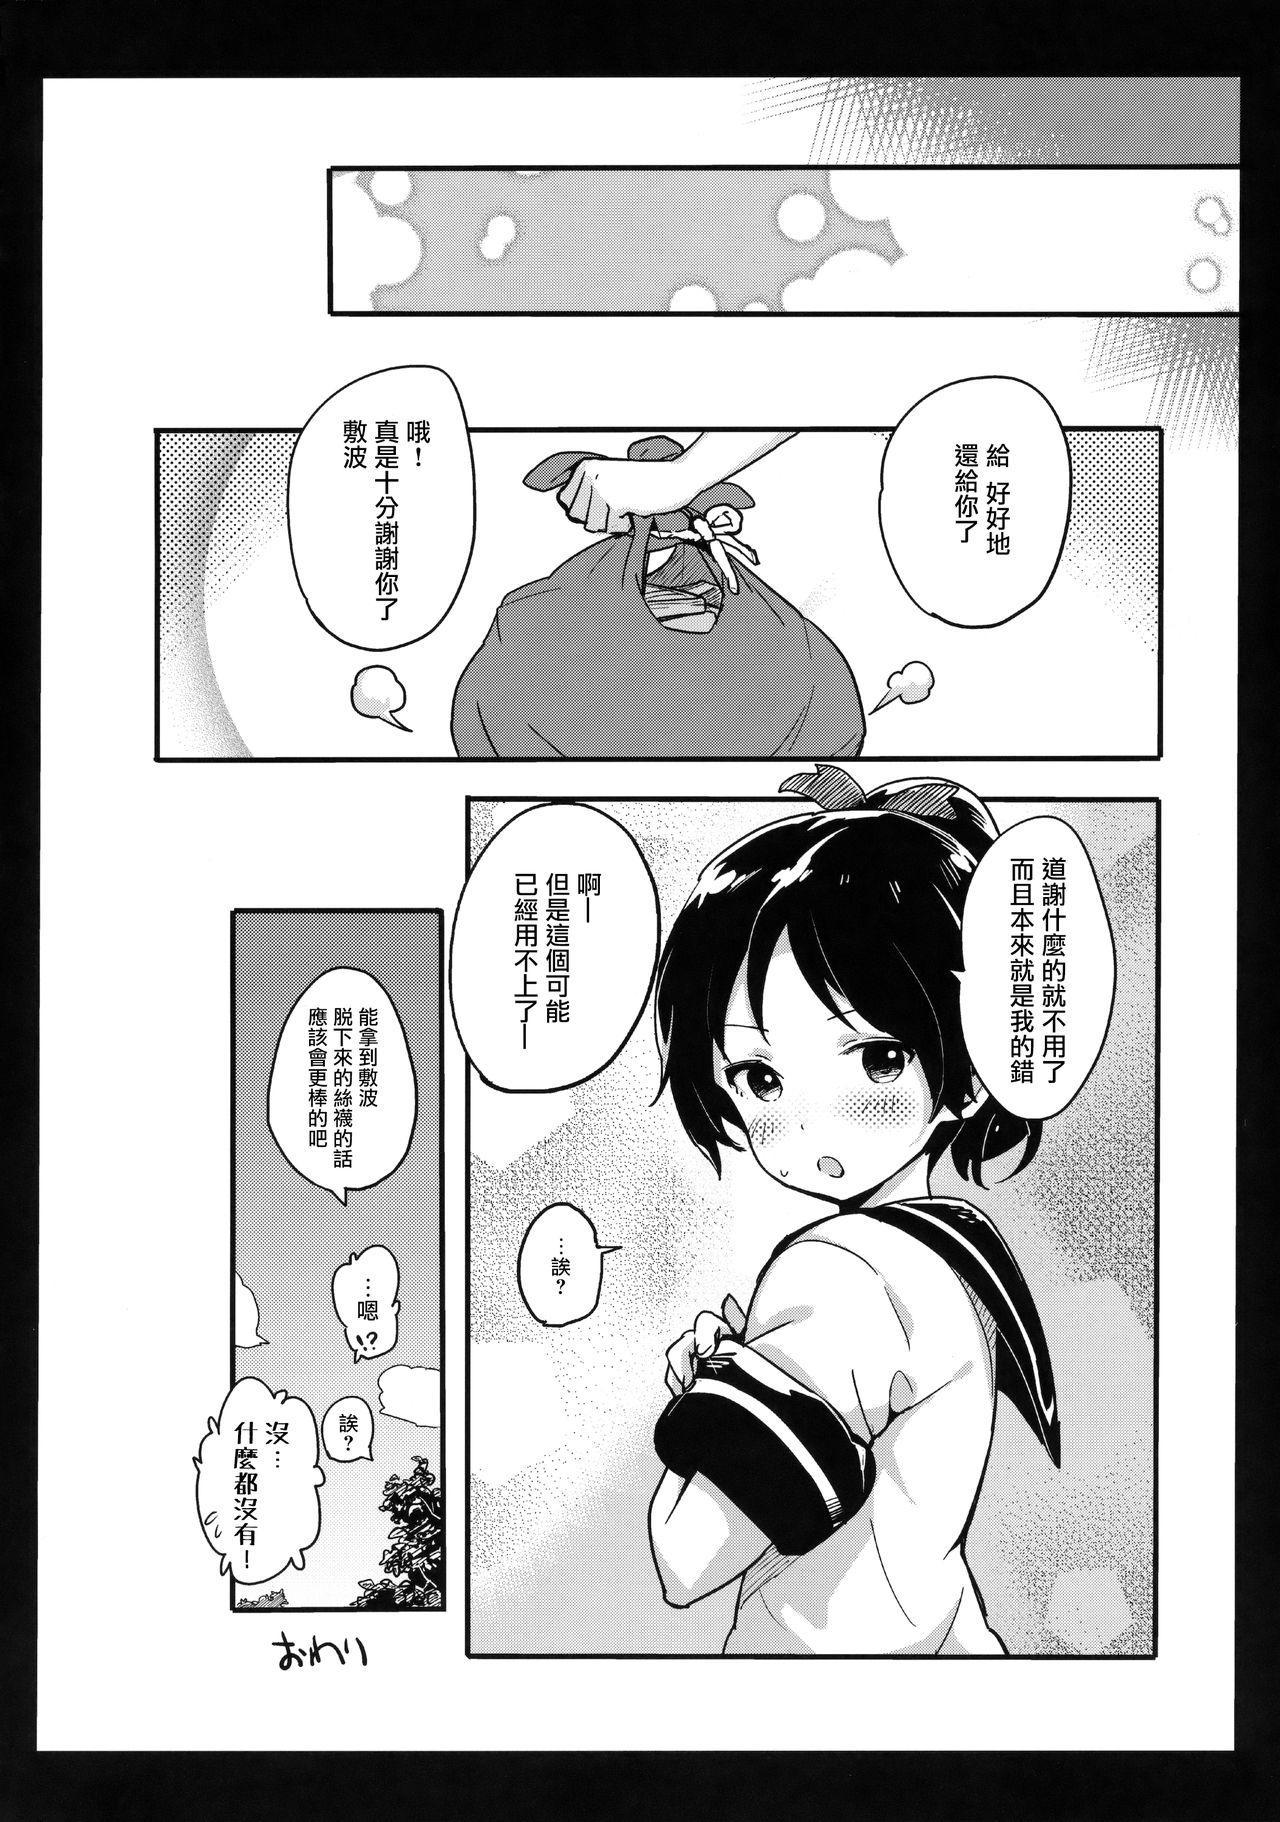 Hanikami Musume no Choroama Life 19